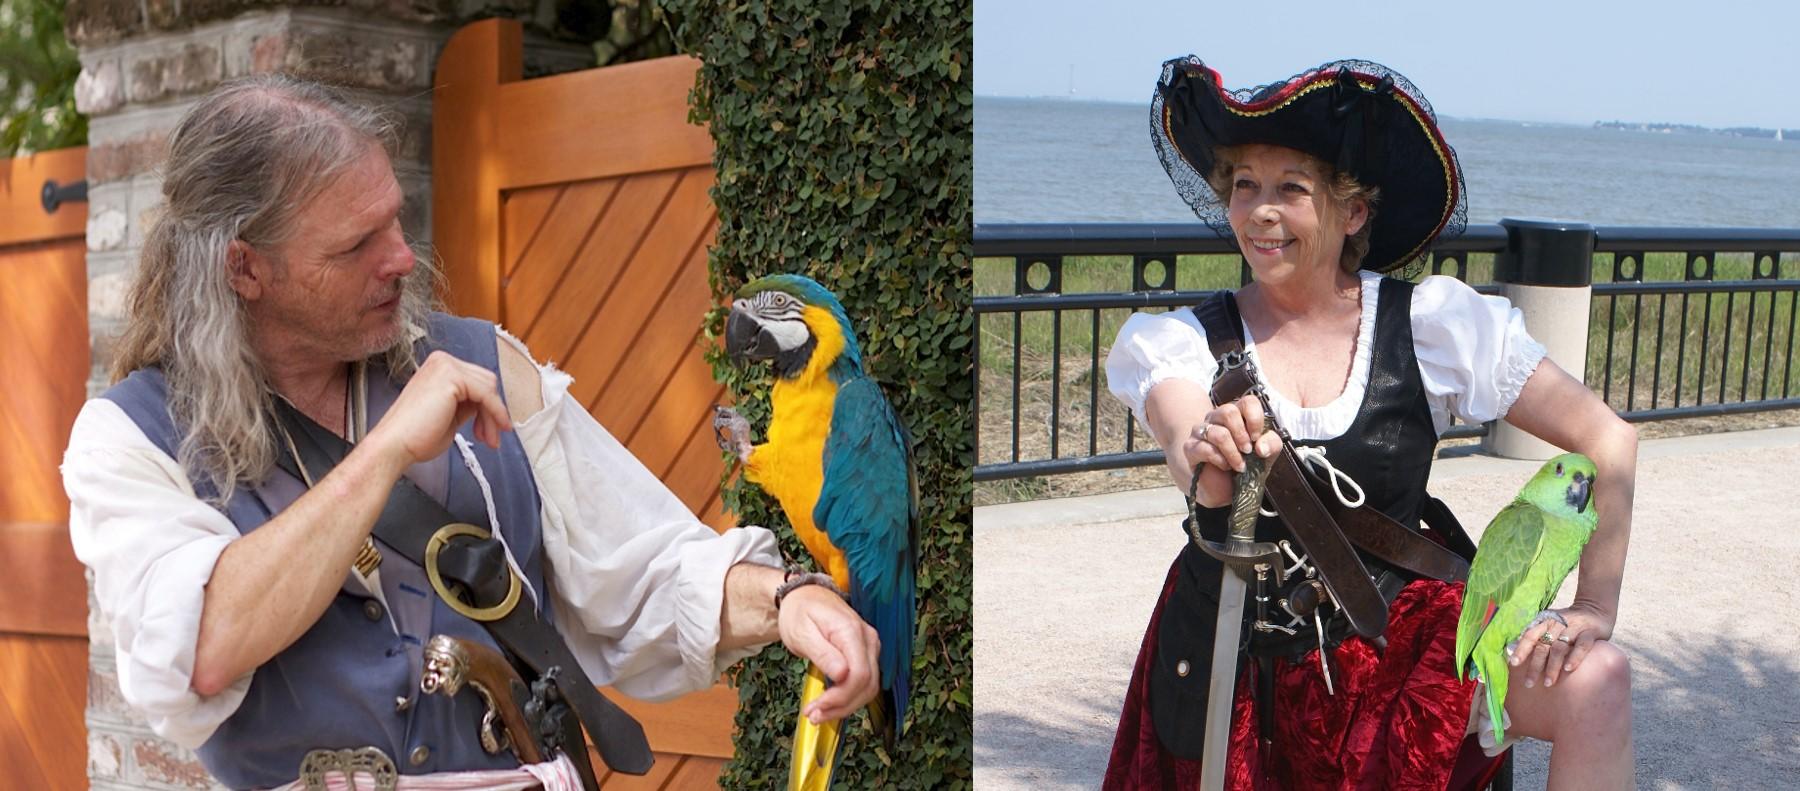 Eric and Sabrina of Charleston Pirate Tours